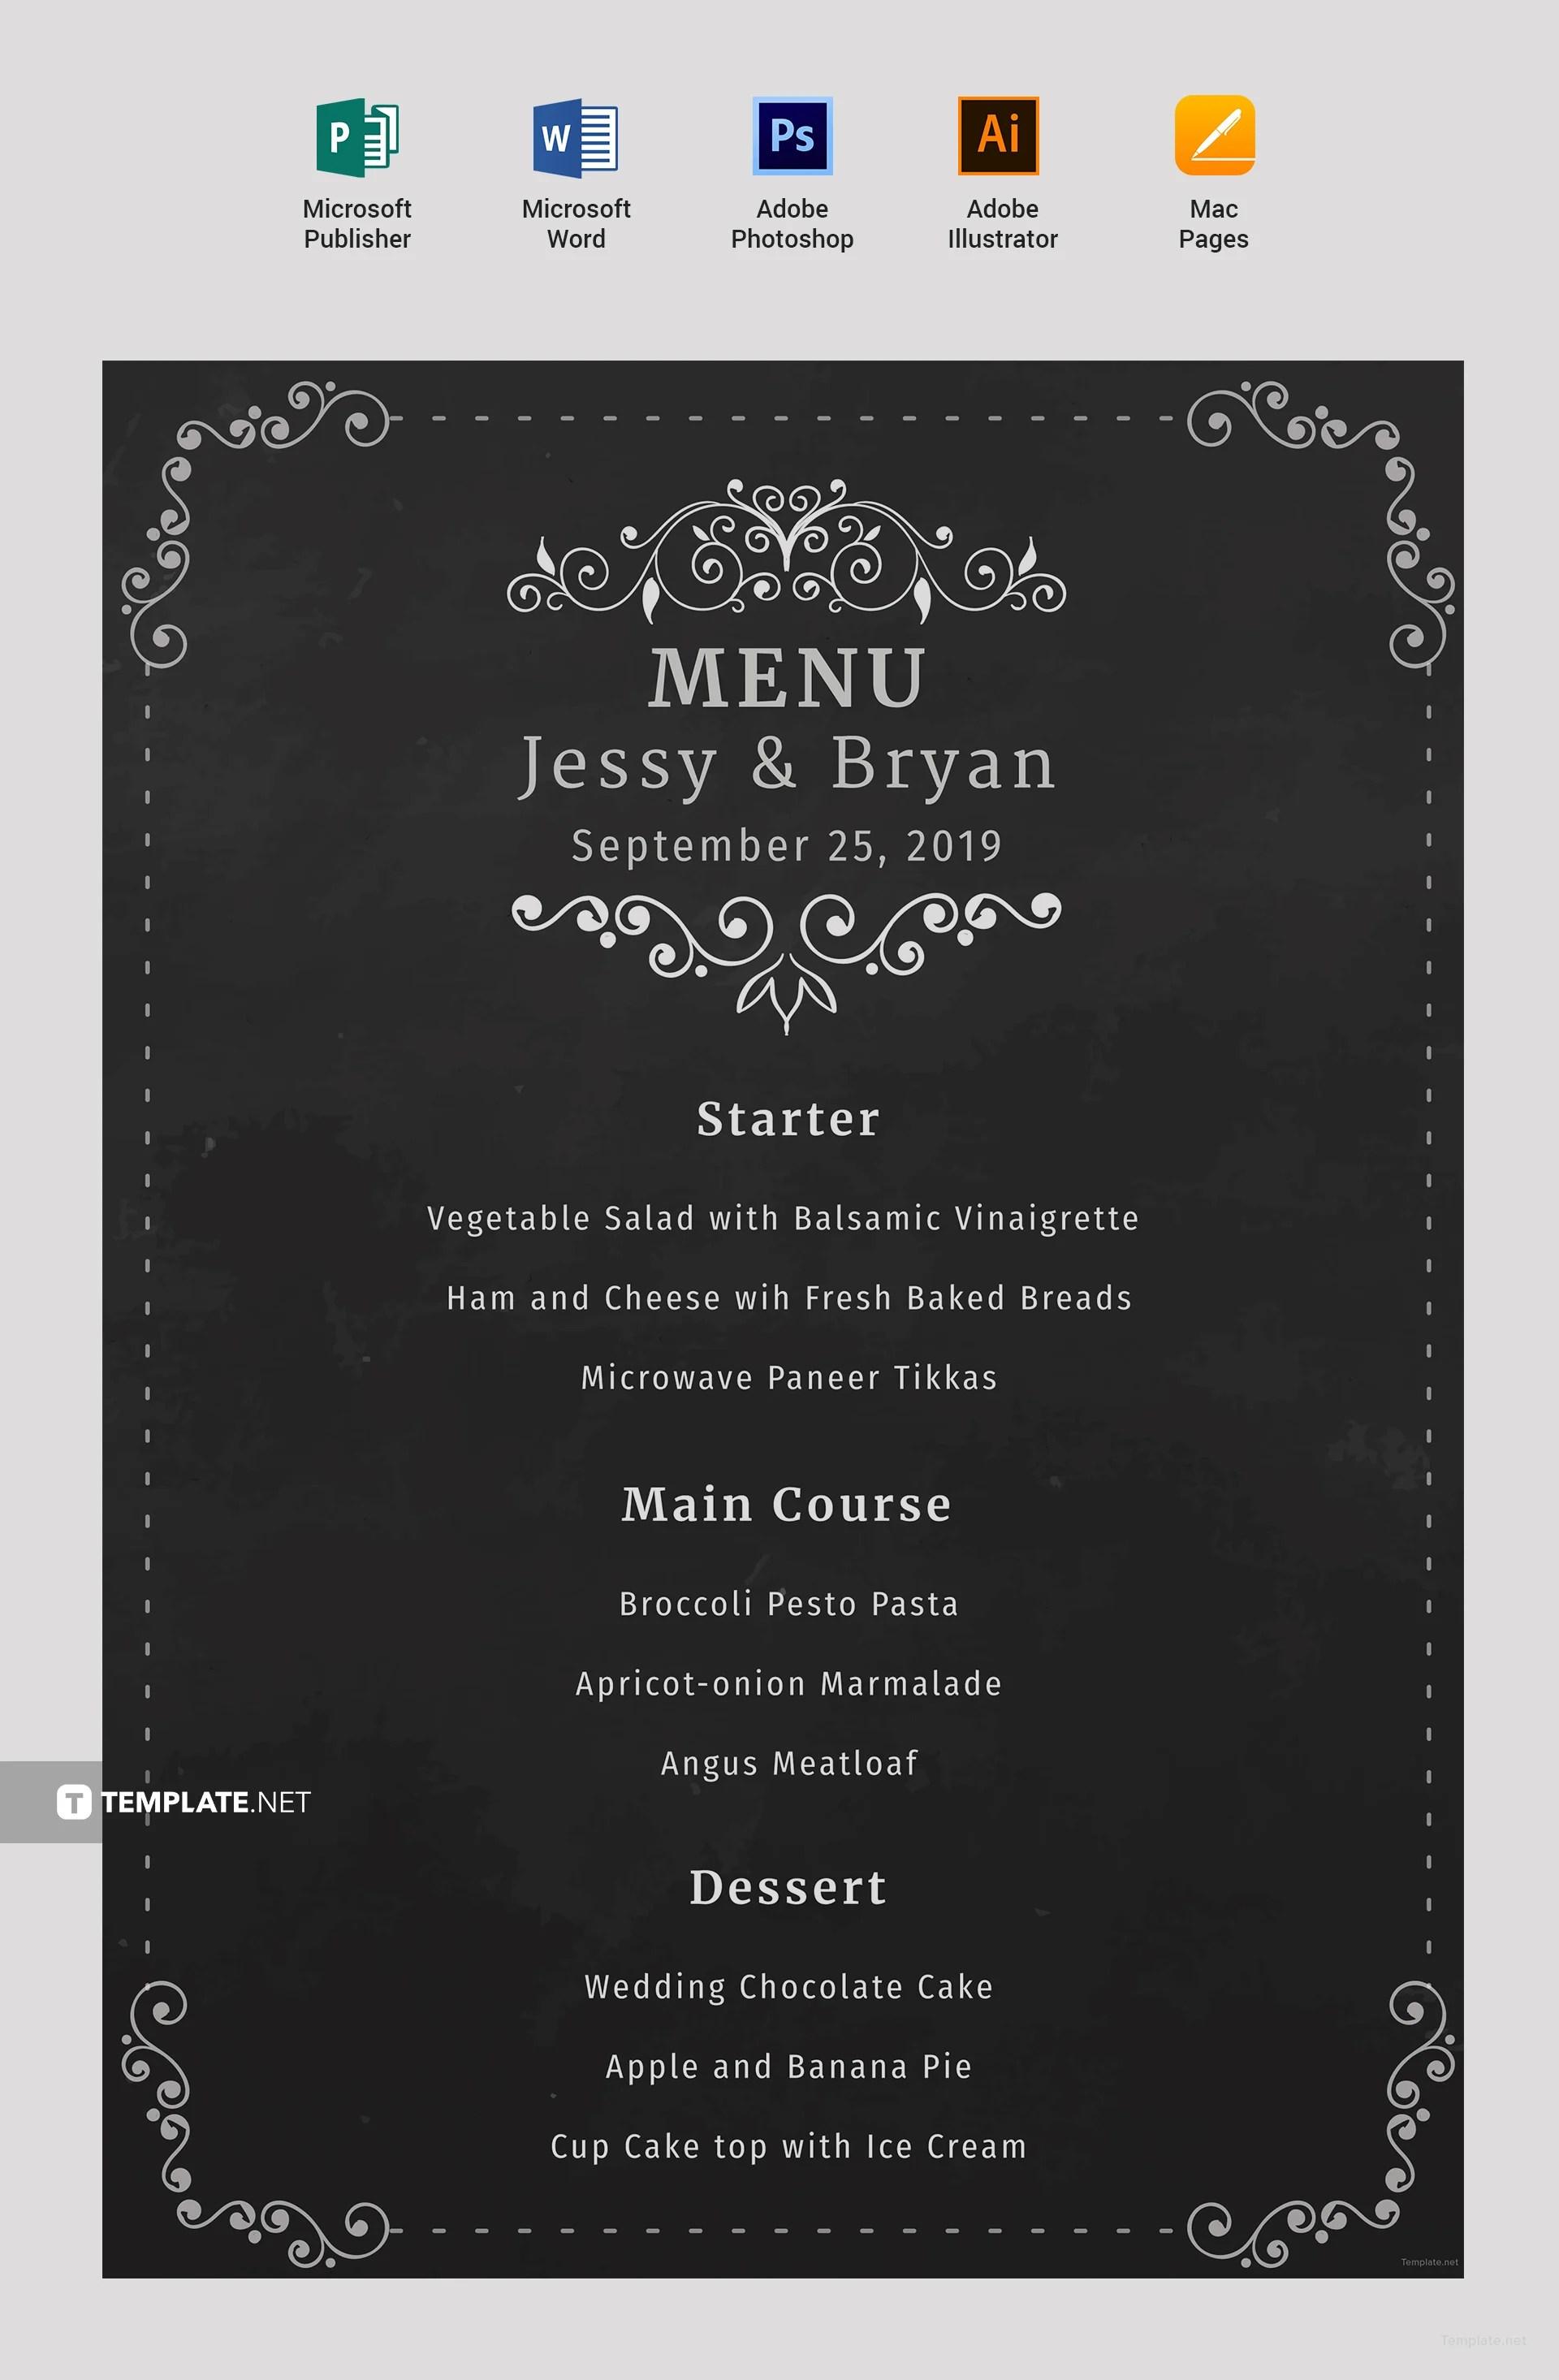 Free Chalkboard Wedding Menu Template In Microsoft Word Microsoft Publisher Adobe Illustrator